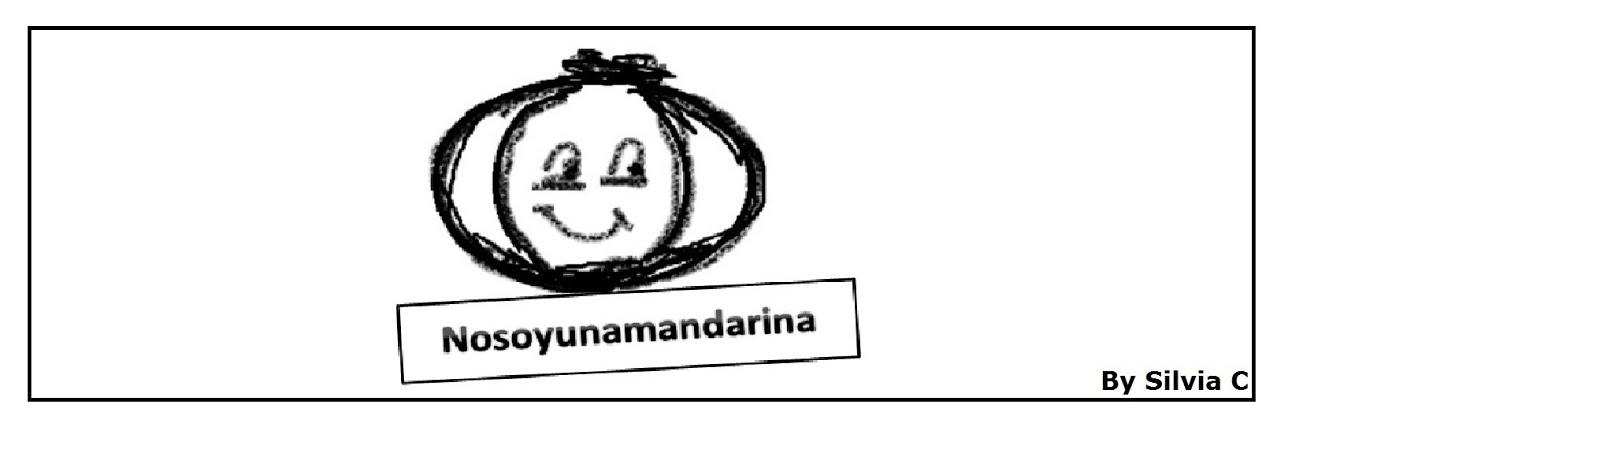 Nosoyunamandarina